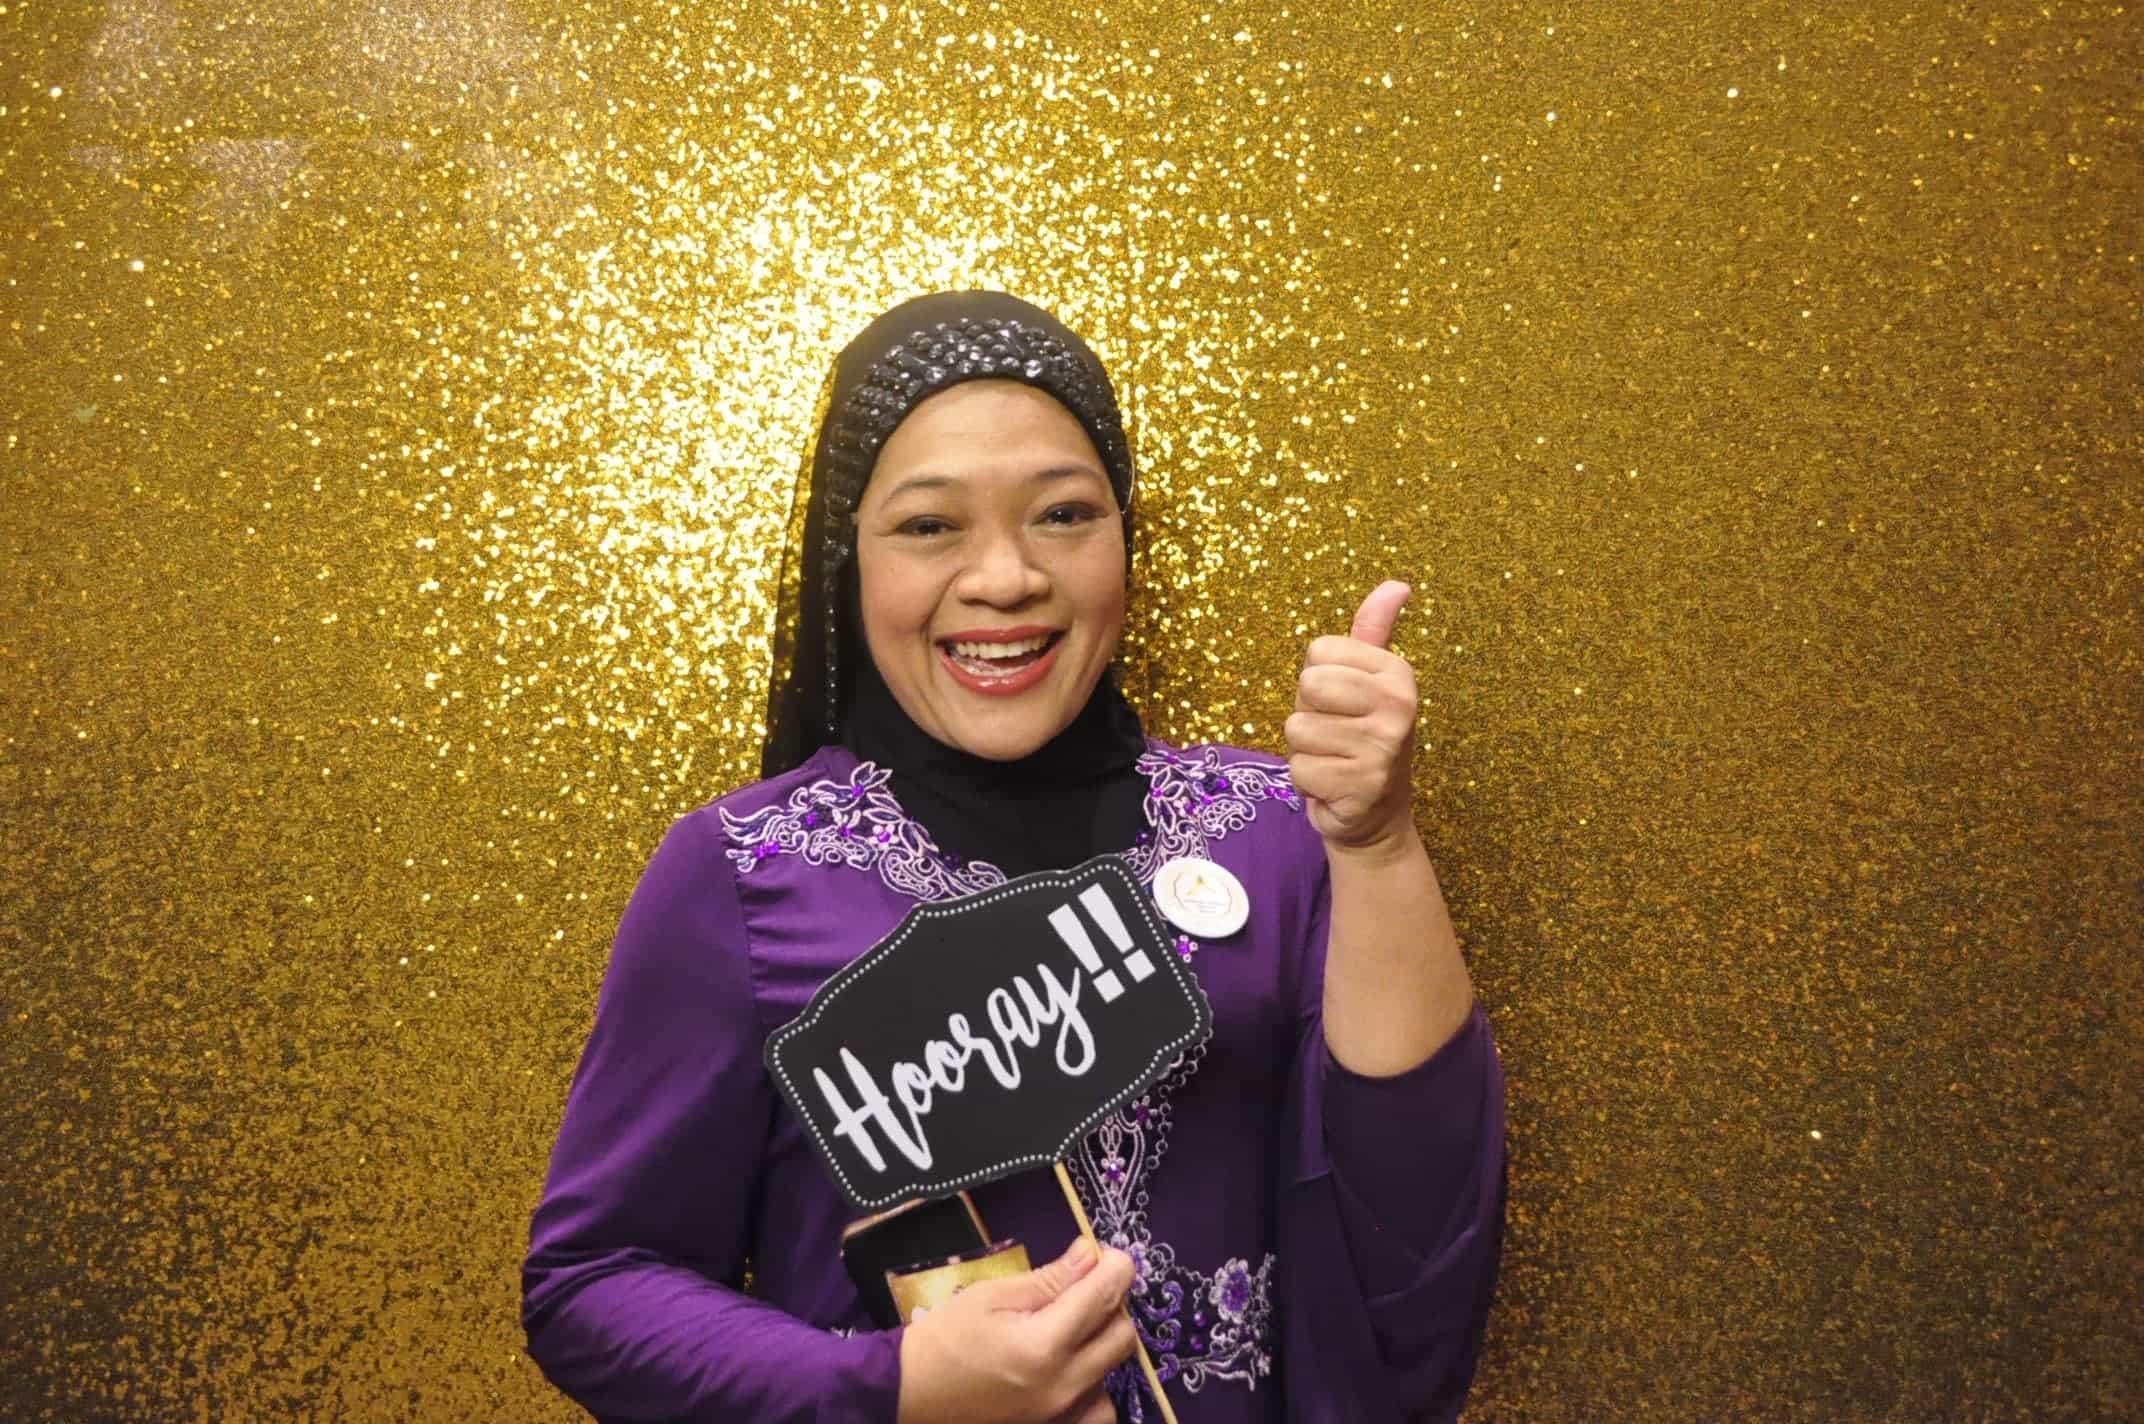 Malam Gala Anggun 2018 (Photobooth) 28